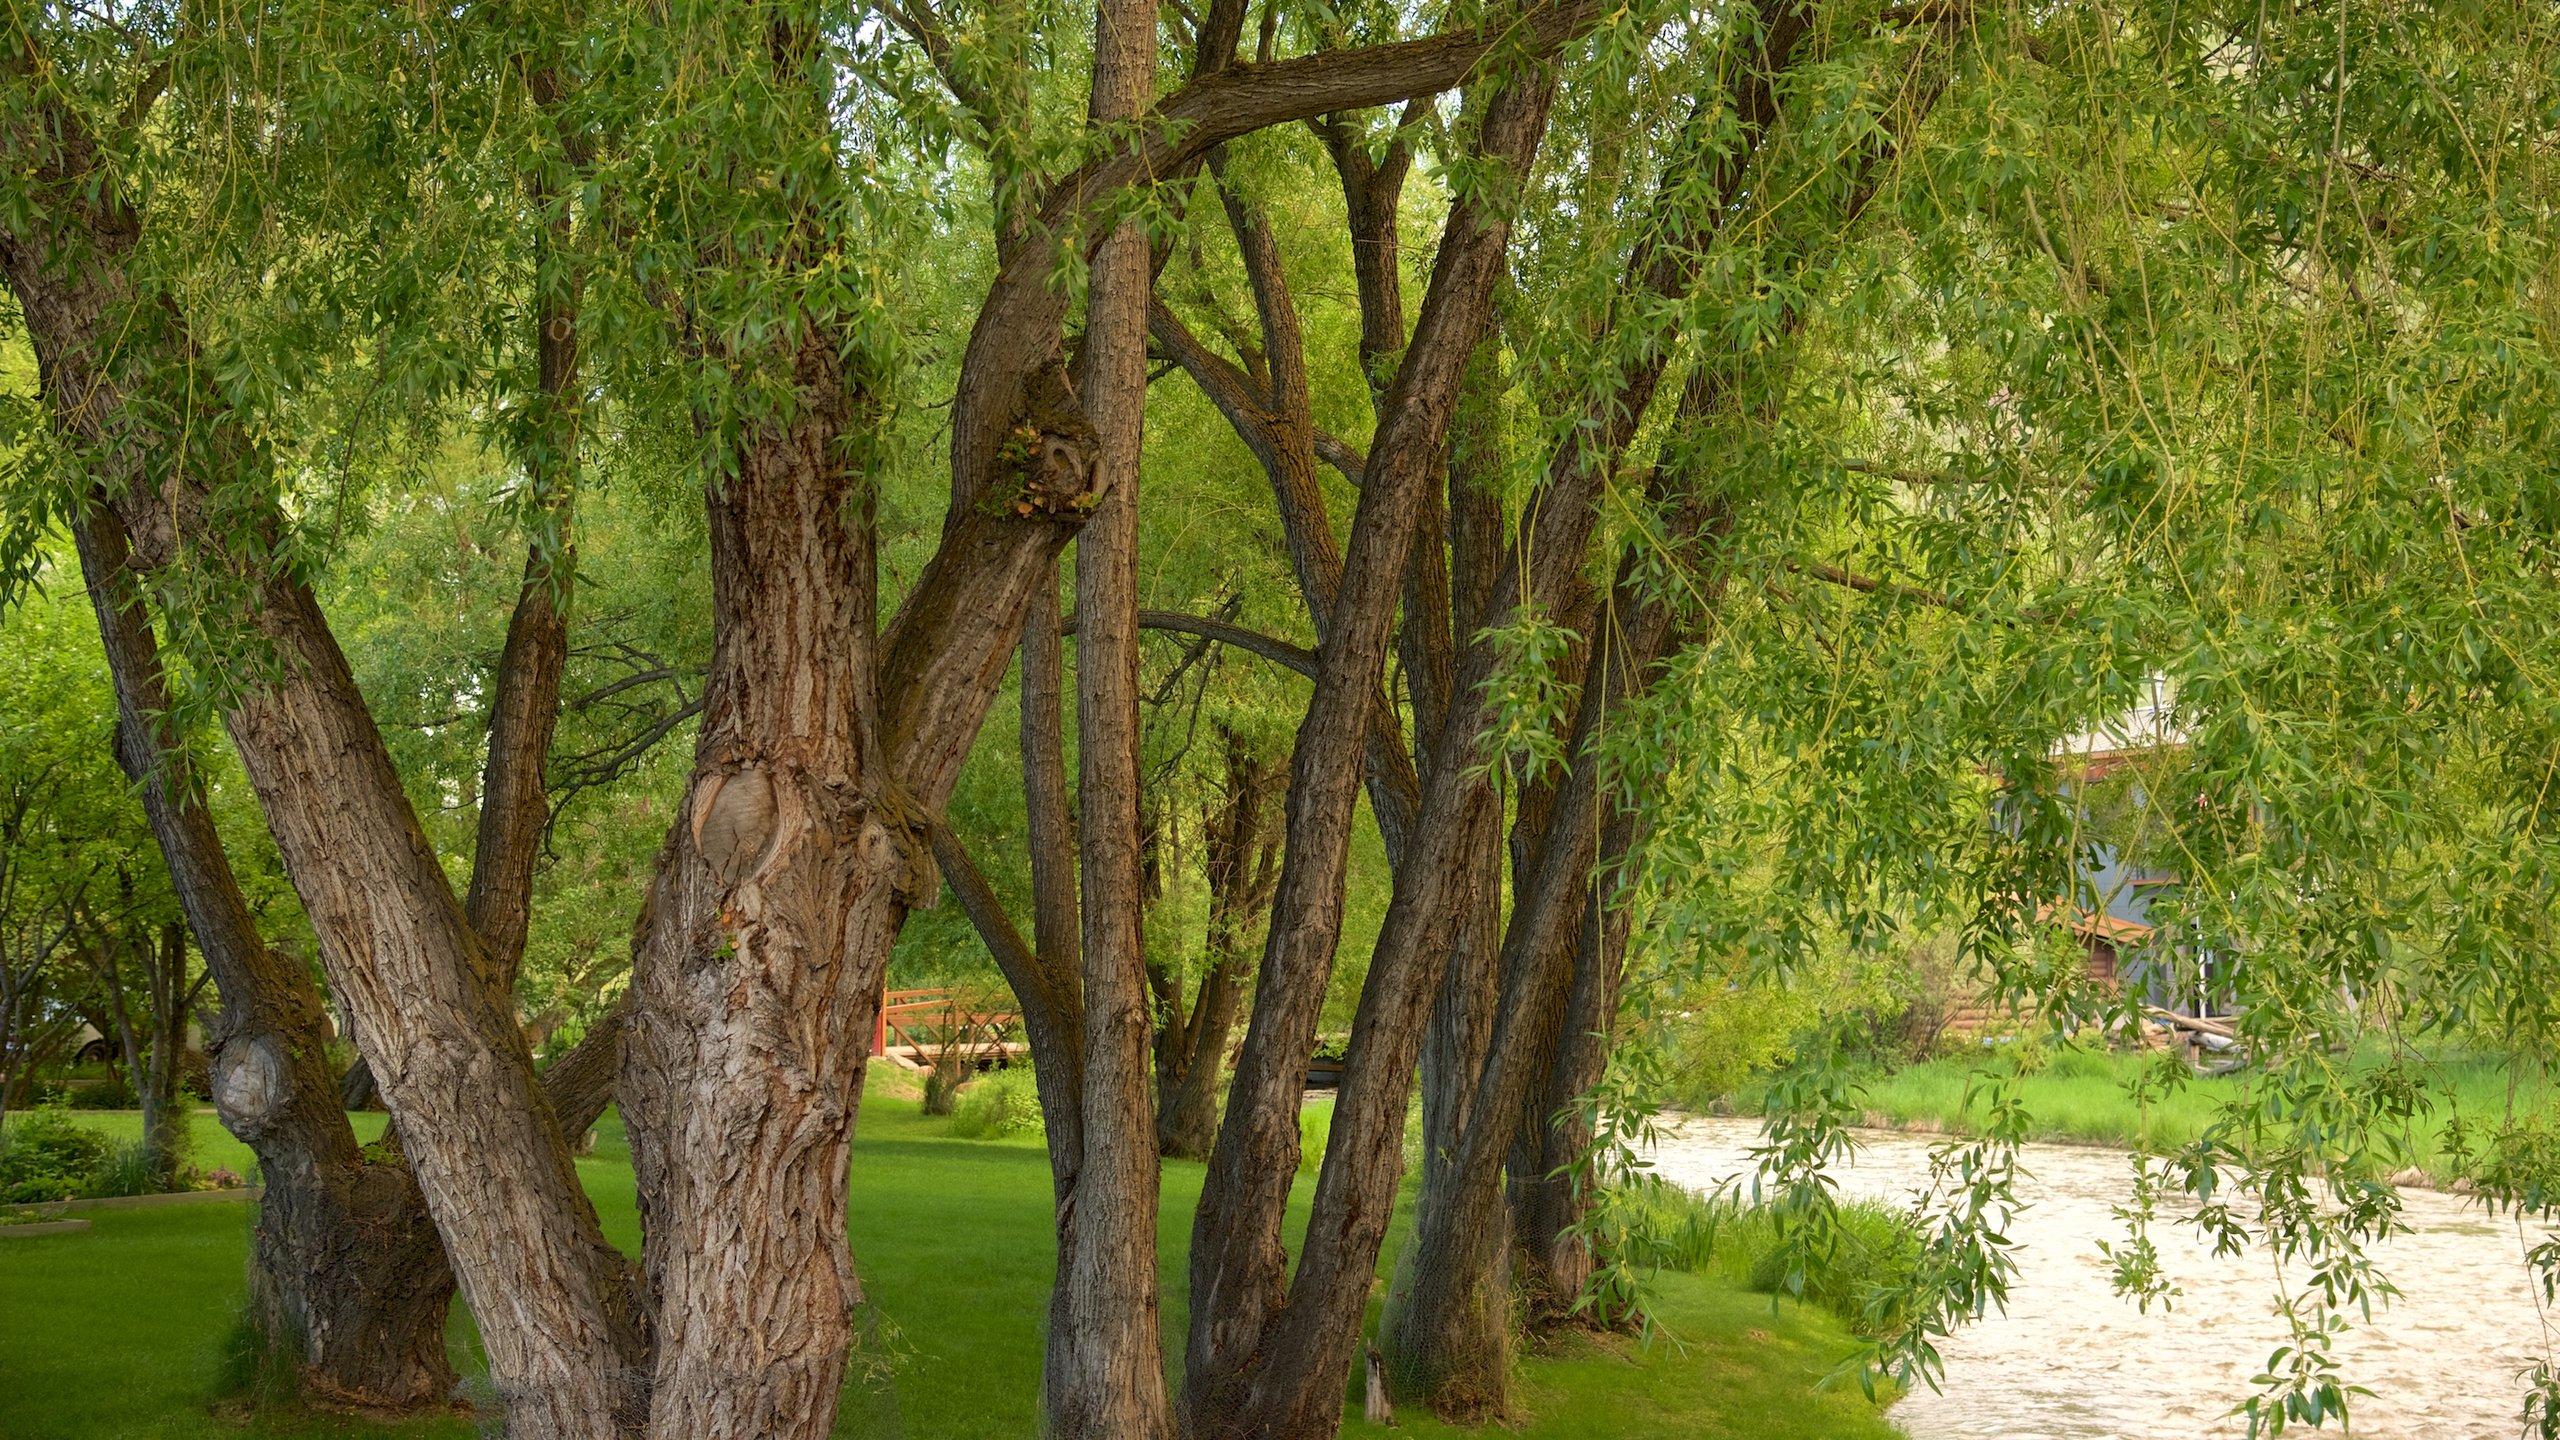 Teton County, Wyoming, United States of America